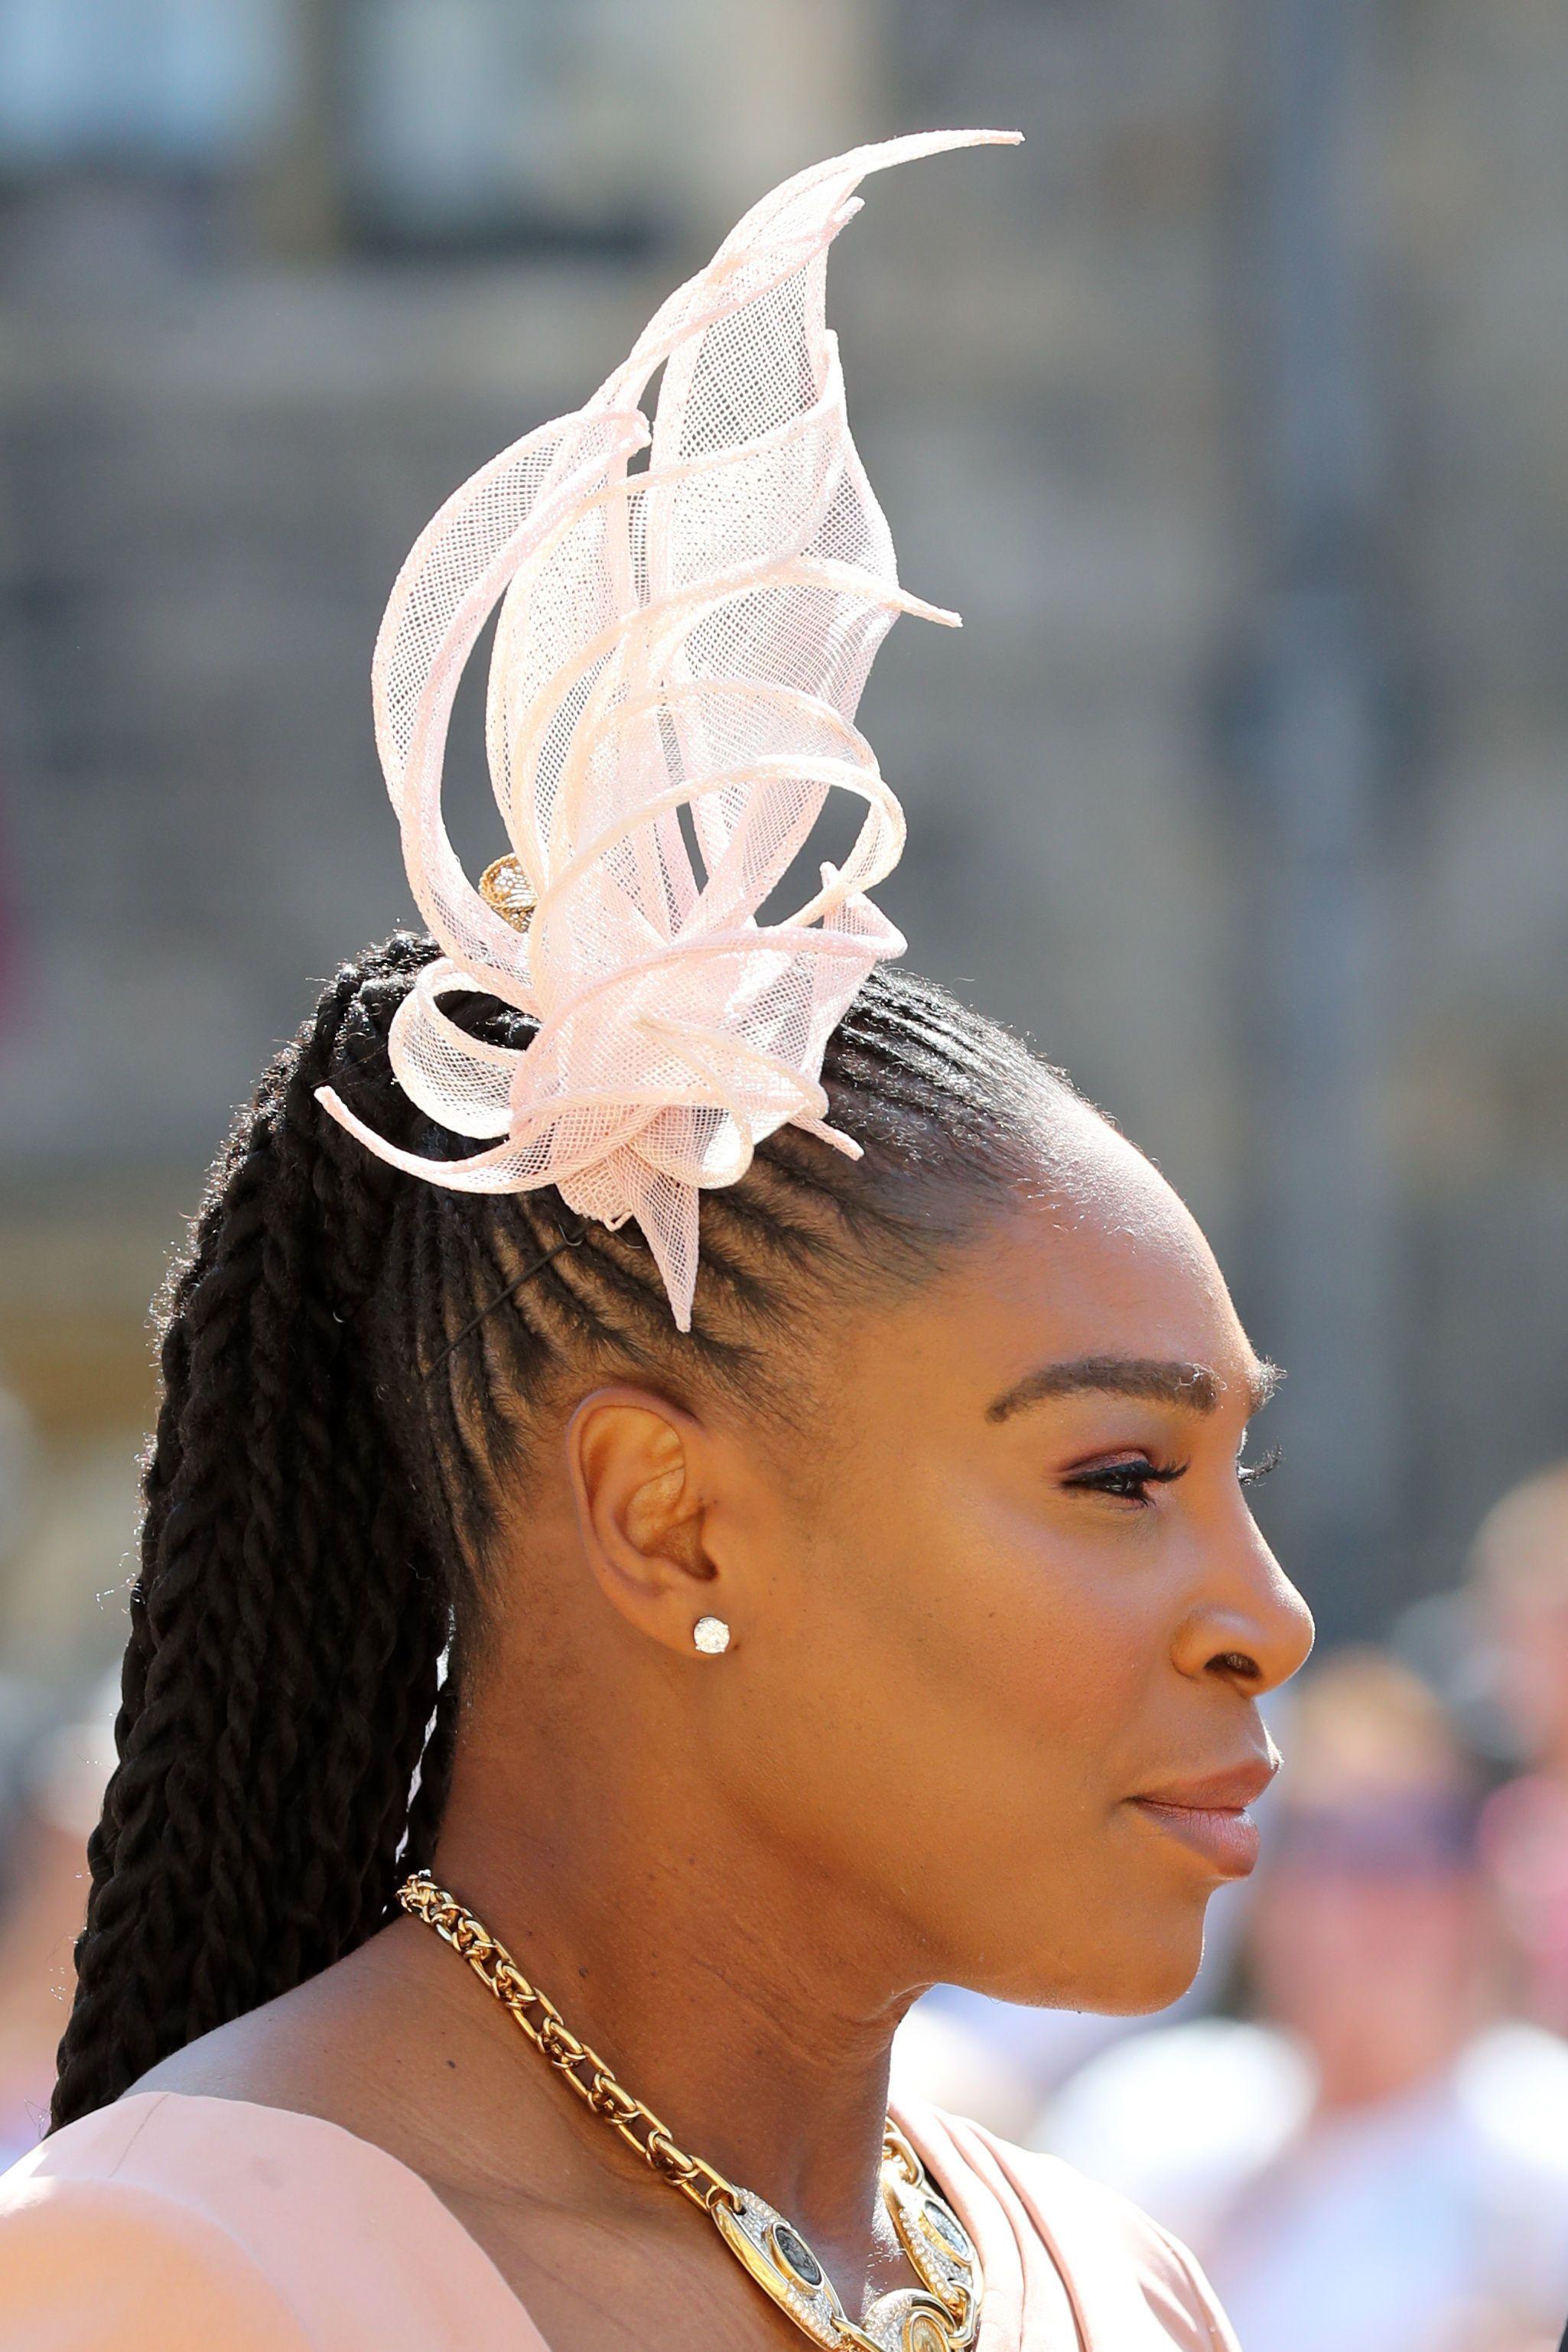 Royal Wedding Fascinators — Hats and Hatinators at Meghan and Harrys  Ceremony 03118ec764a